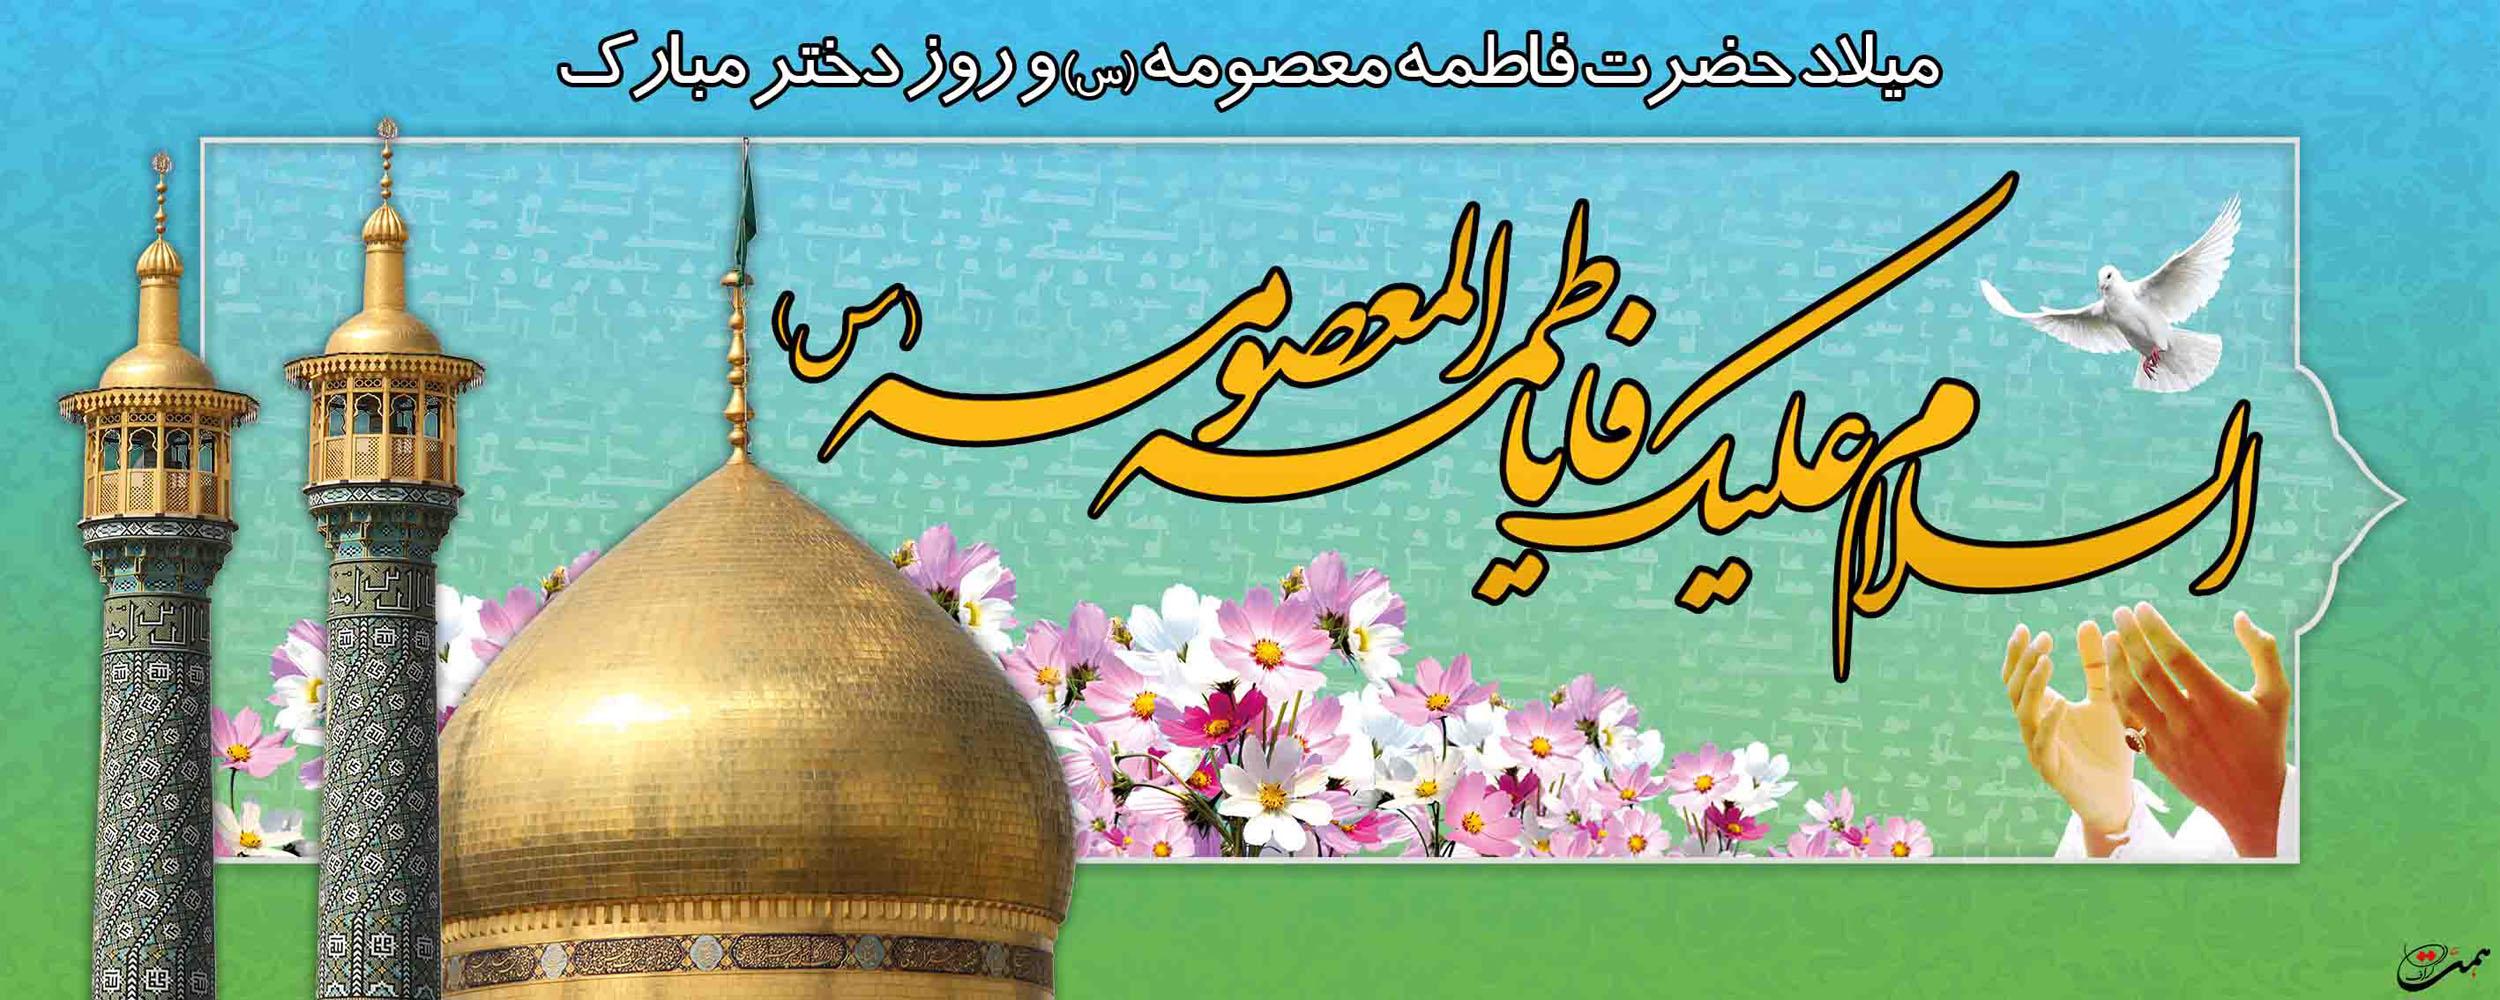 Image result for میلاد حضرت معصومه